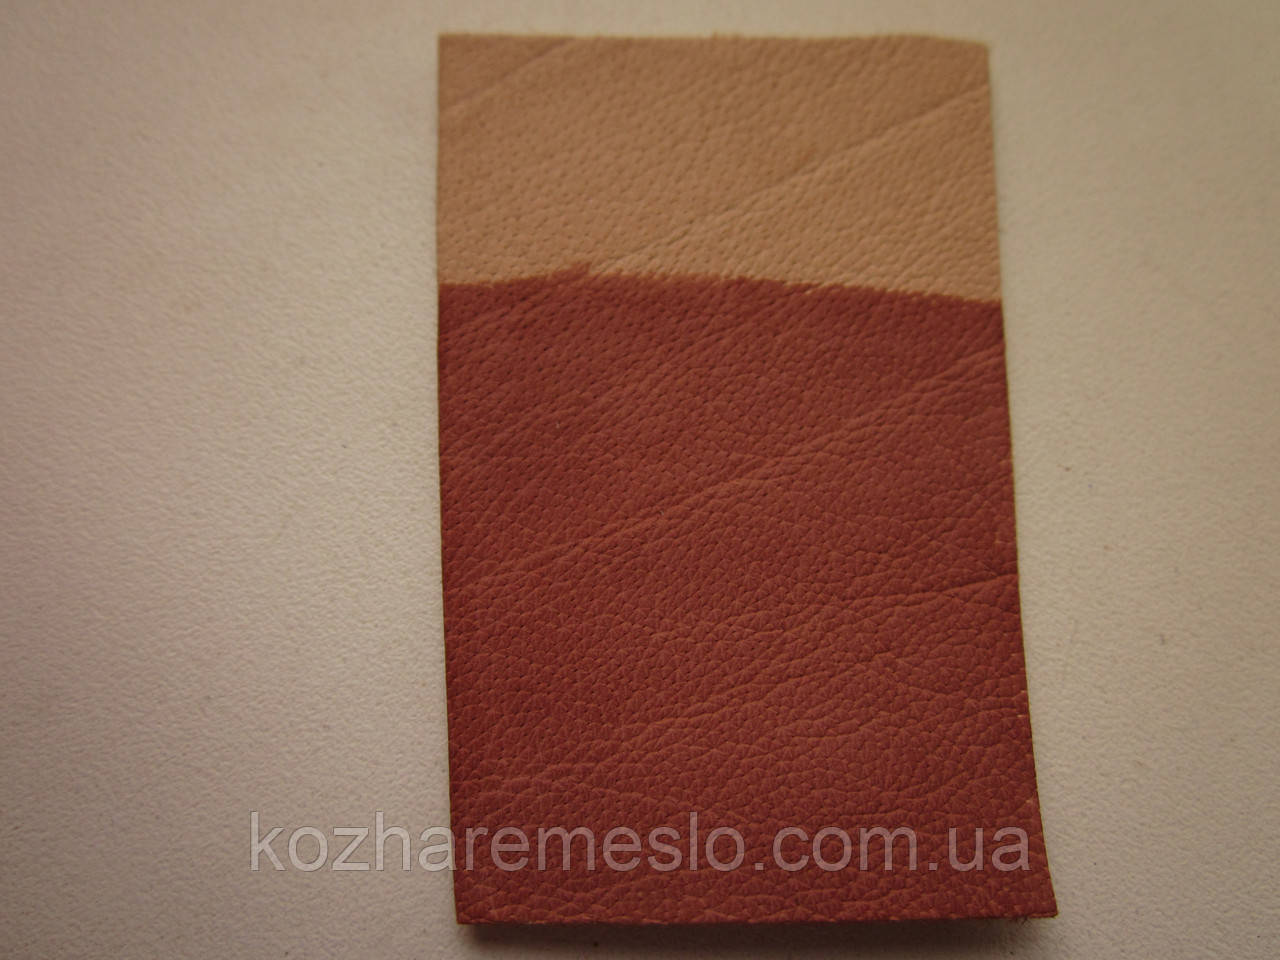 Краска для кожи спиртовая TOLEDO SUPER 50 мл каштановая